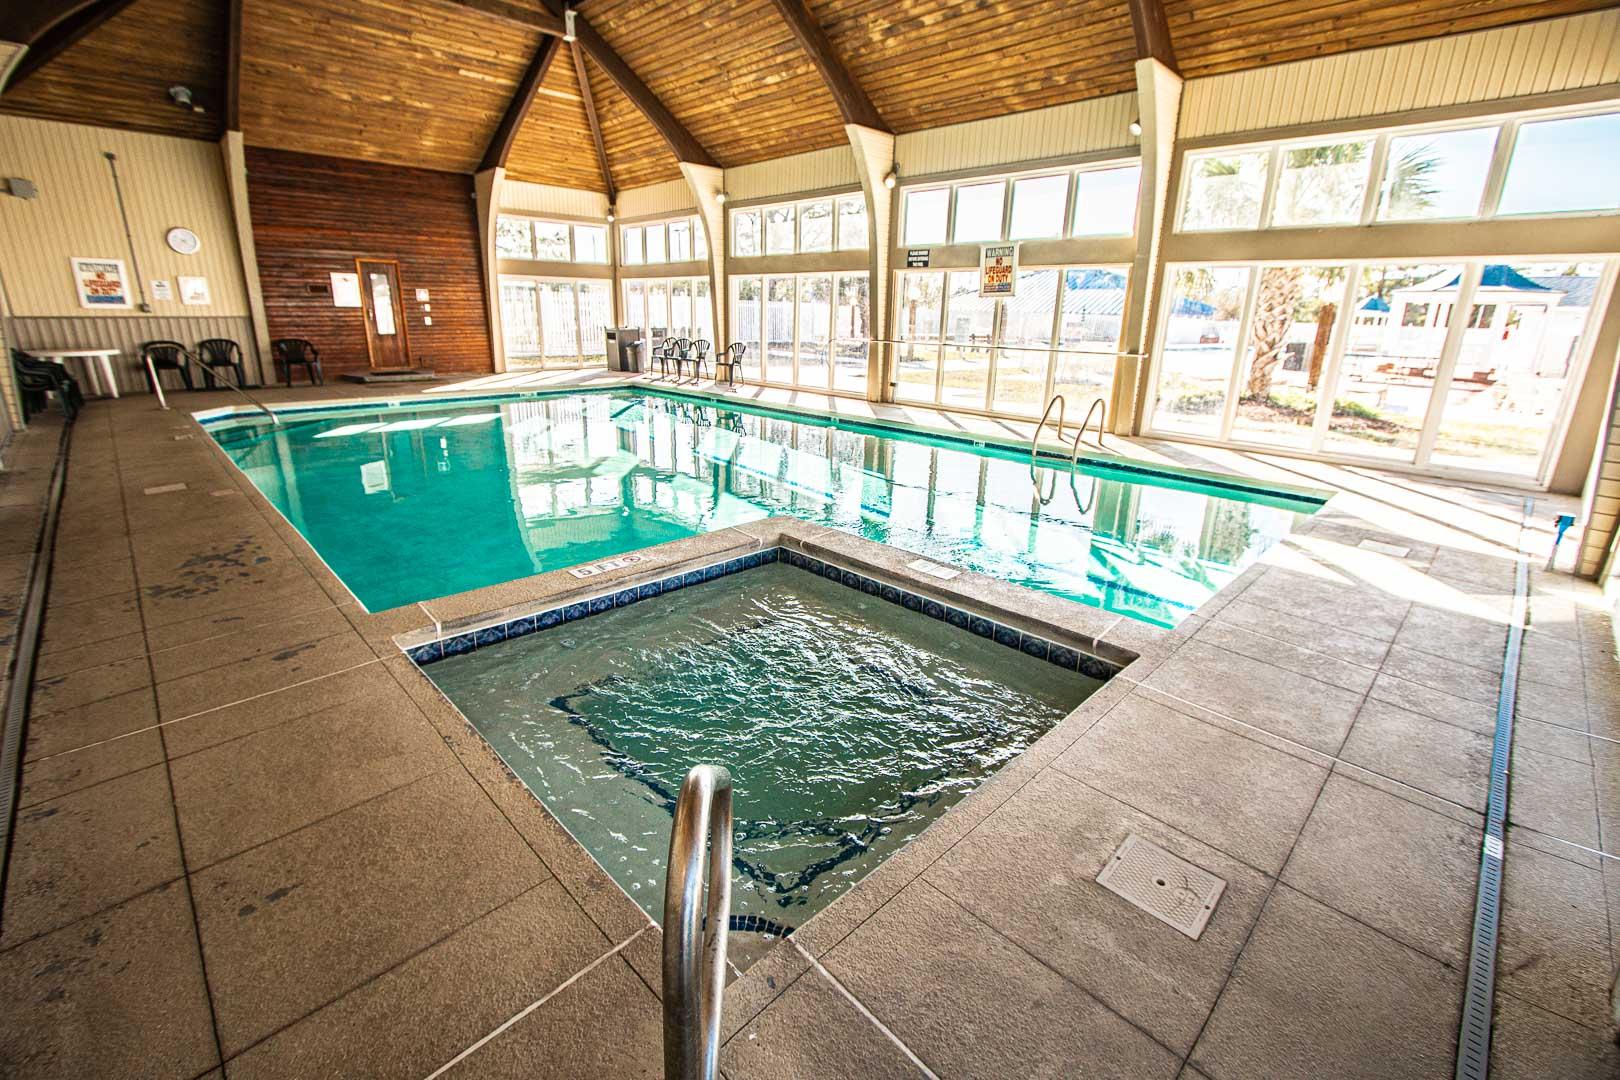 An indoor swimming pool at VRI's Waterwood Townhomes in New Bern, North Carolina.